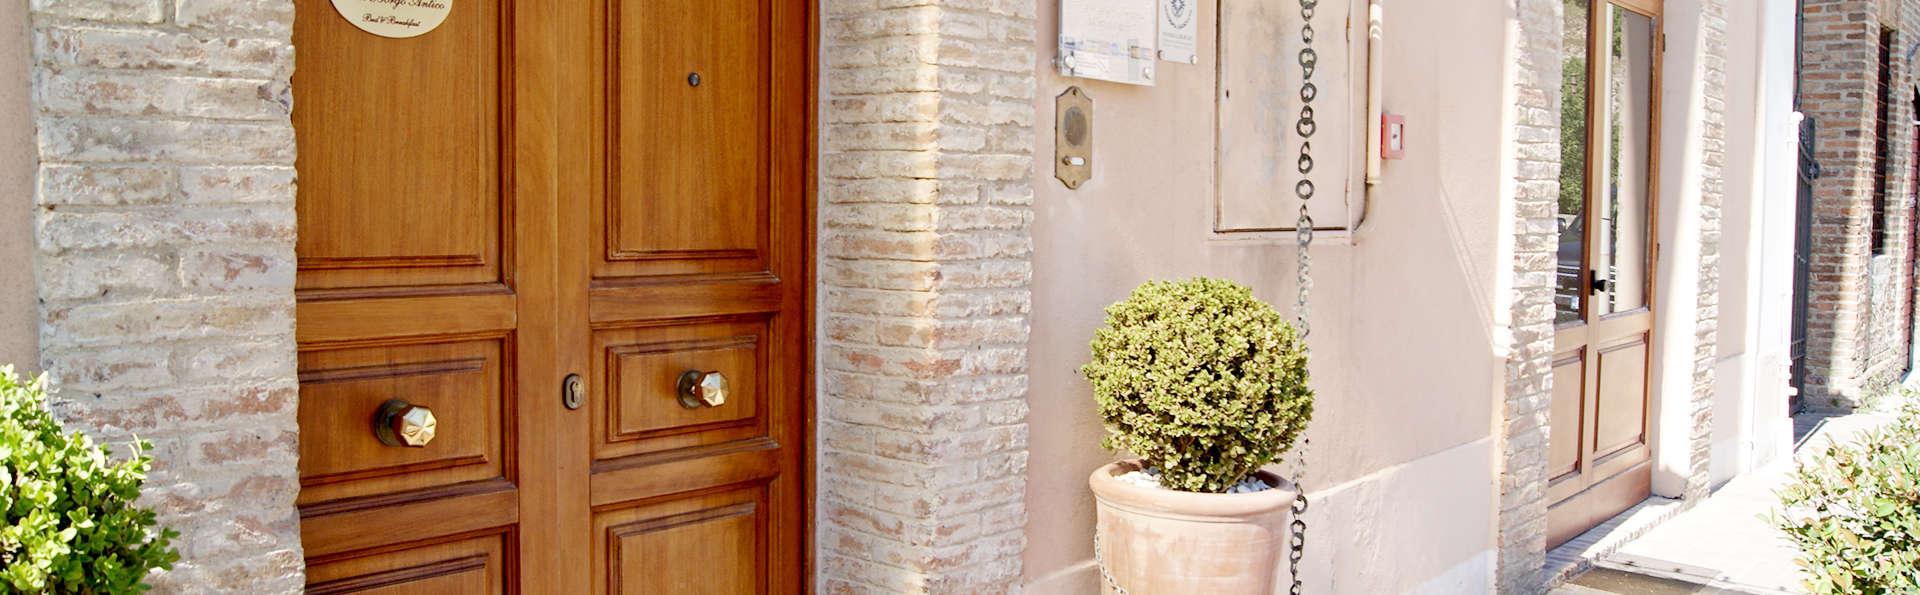 Hotel Borgo Antico - Edit_Front.jpg